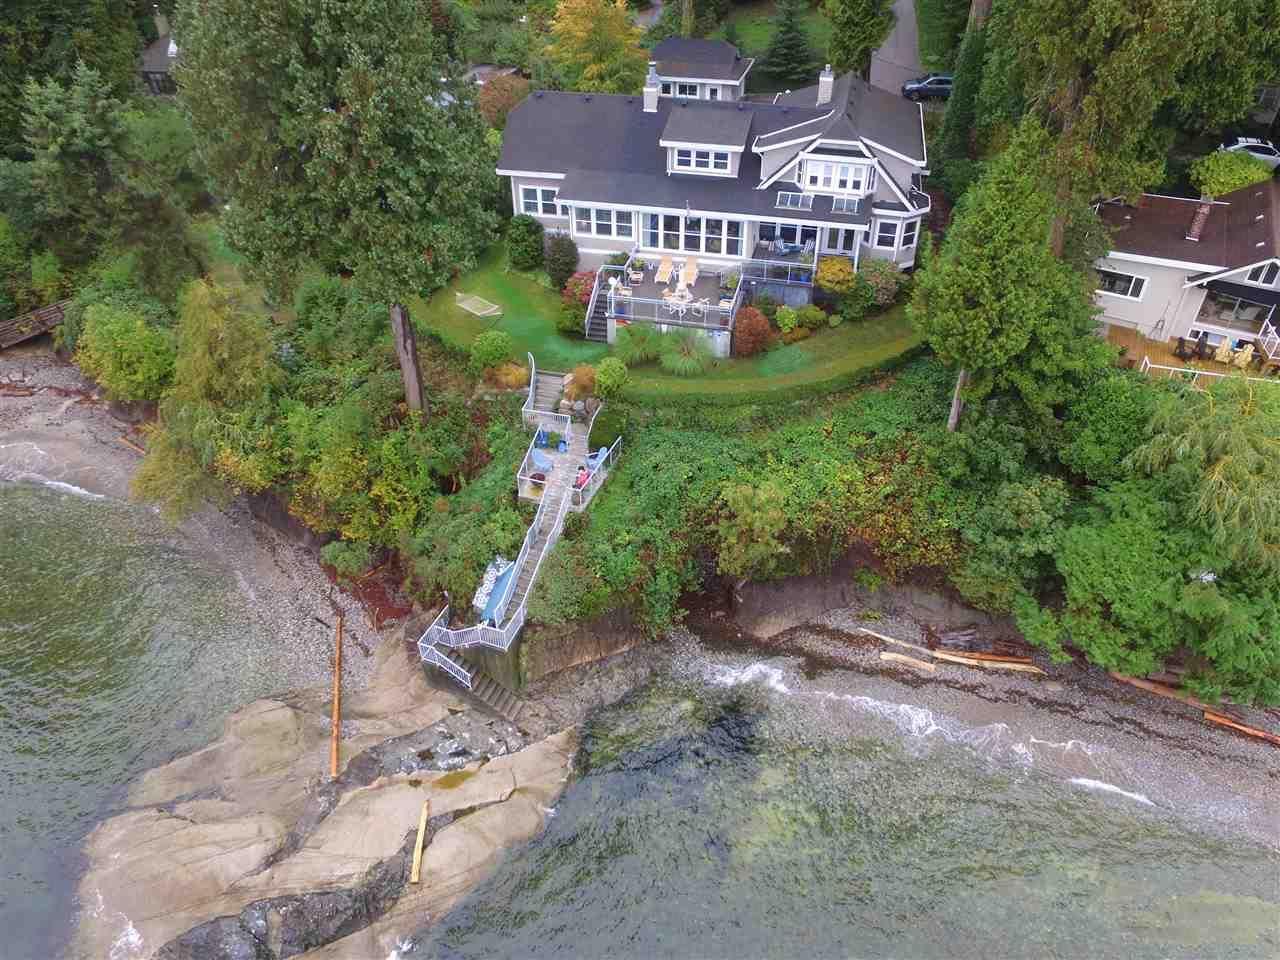 Main Photo: 3435 BEACH AVENUE: Roberts Creek House for sale (Sunshine Coast)  : MLS®# R2414197